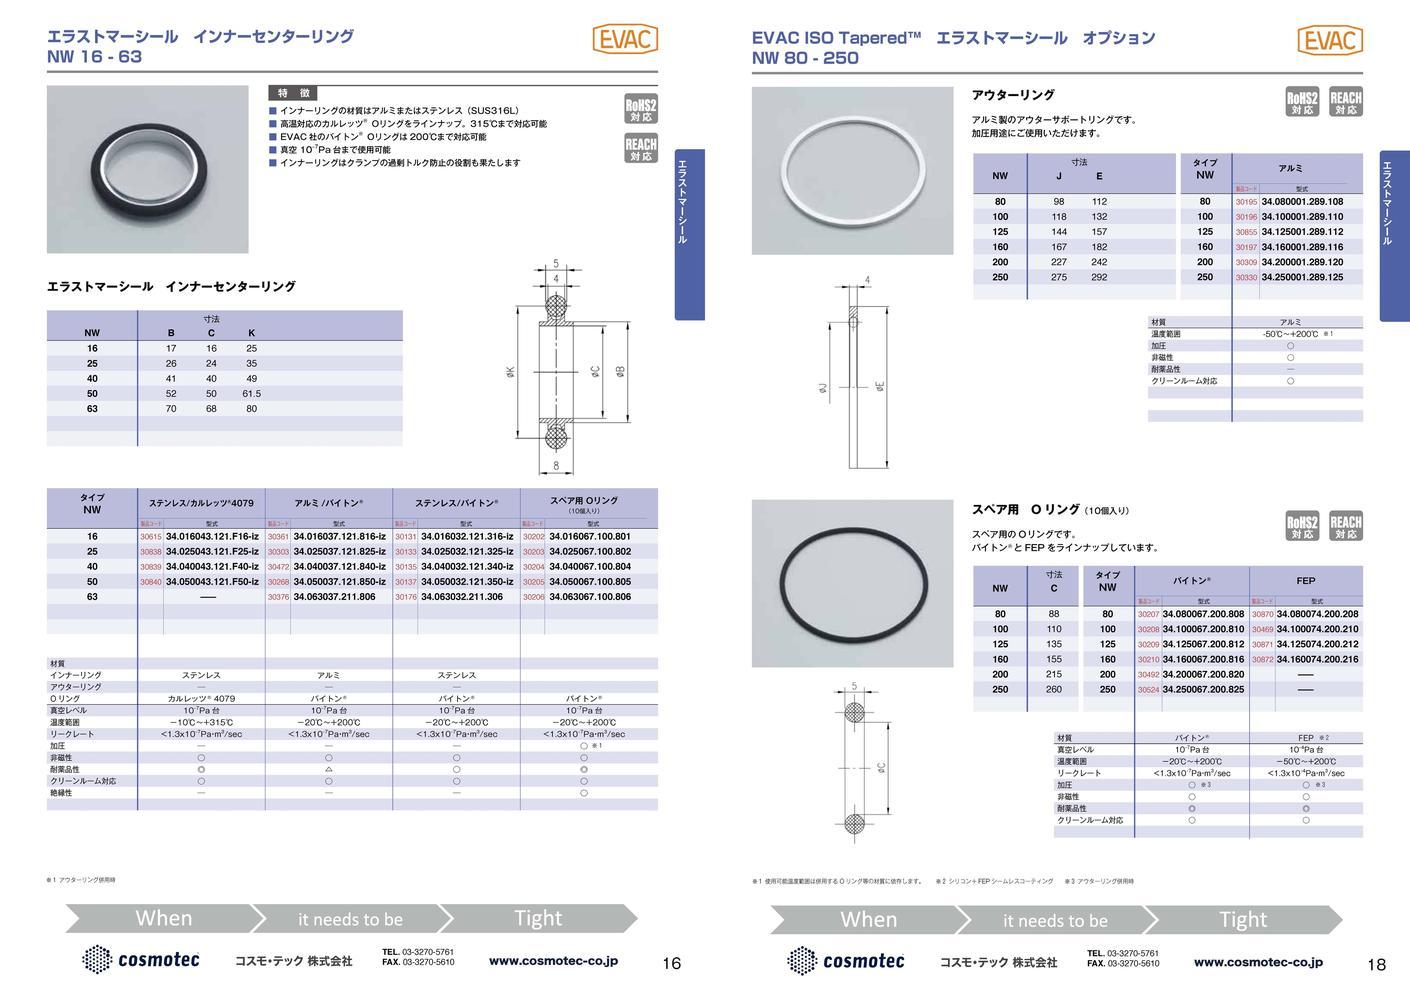 NW/KF Oリング バイトン® EVAC社製 カタログ画像